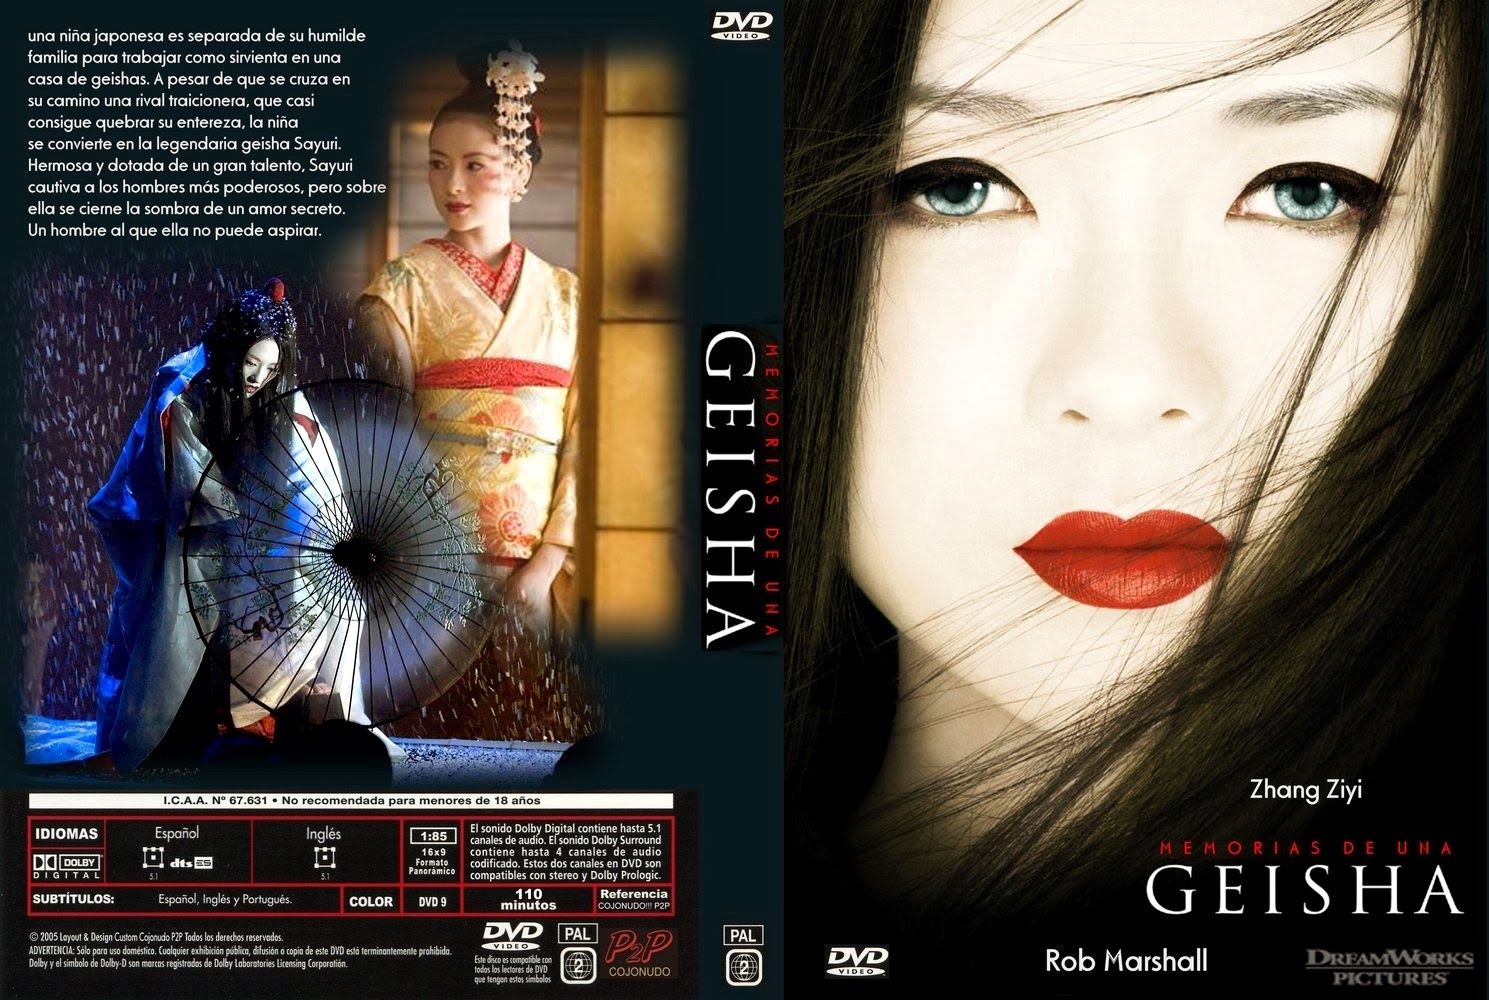 Memorias de un audio geisha